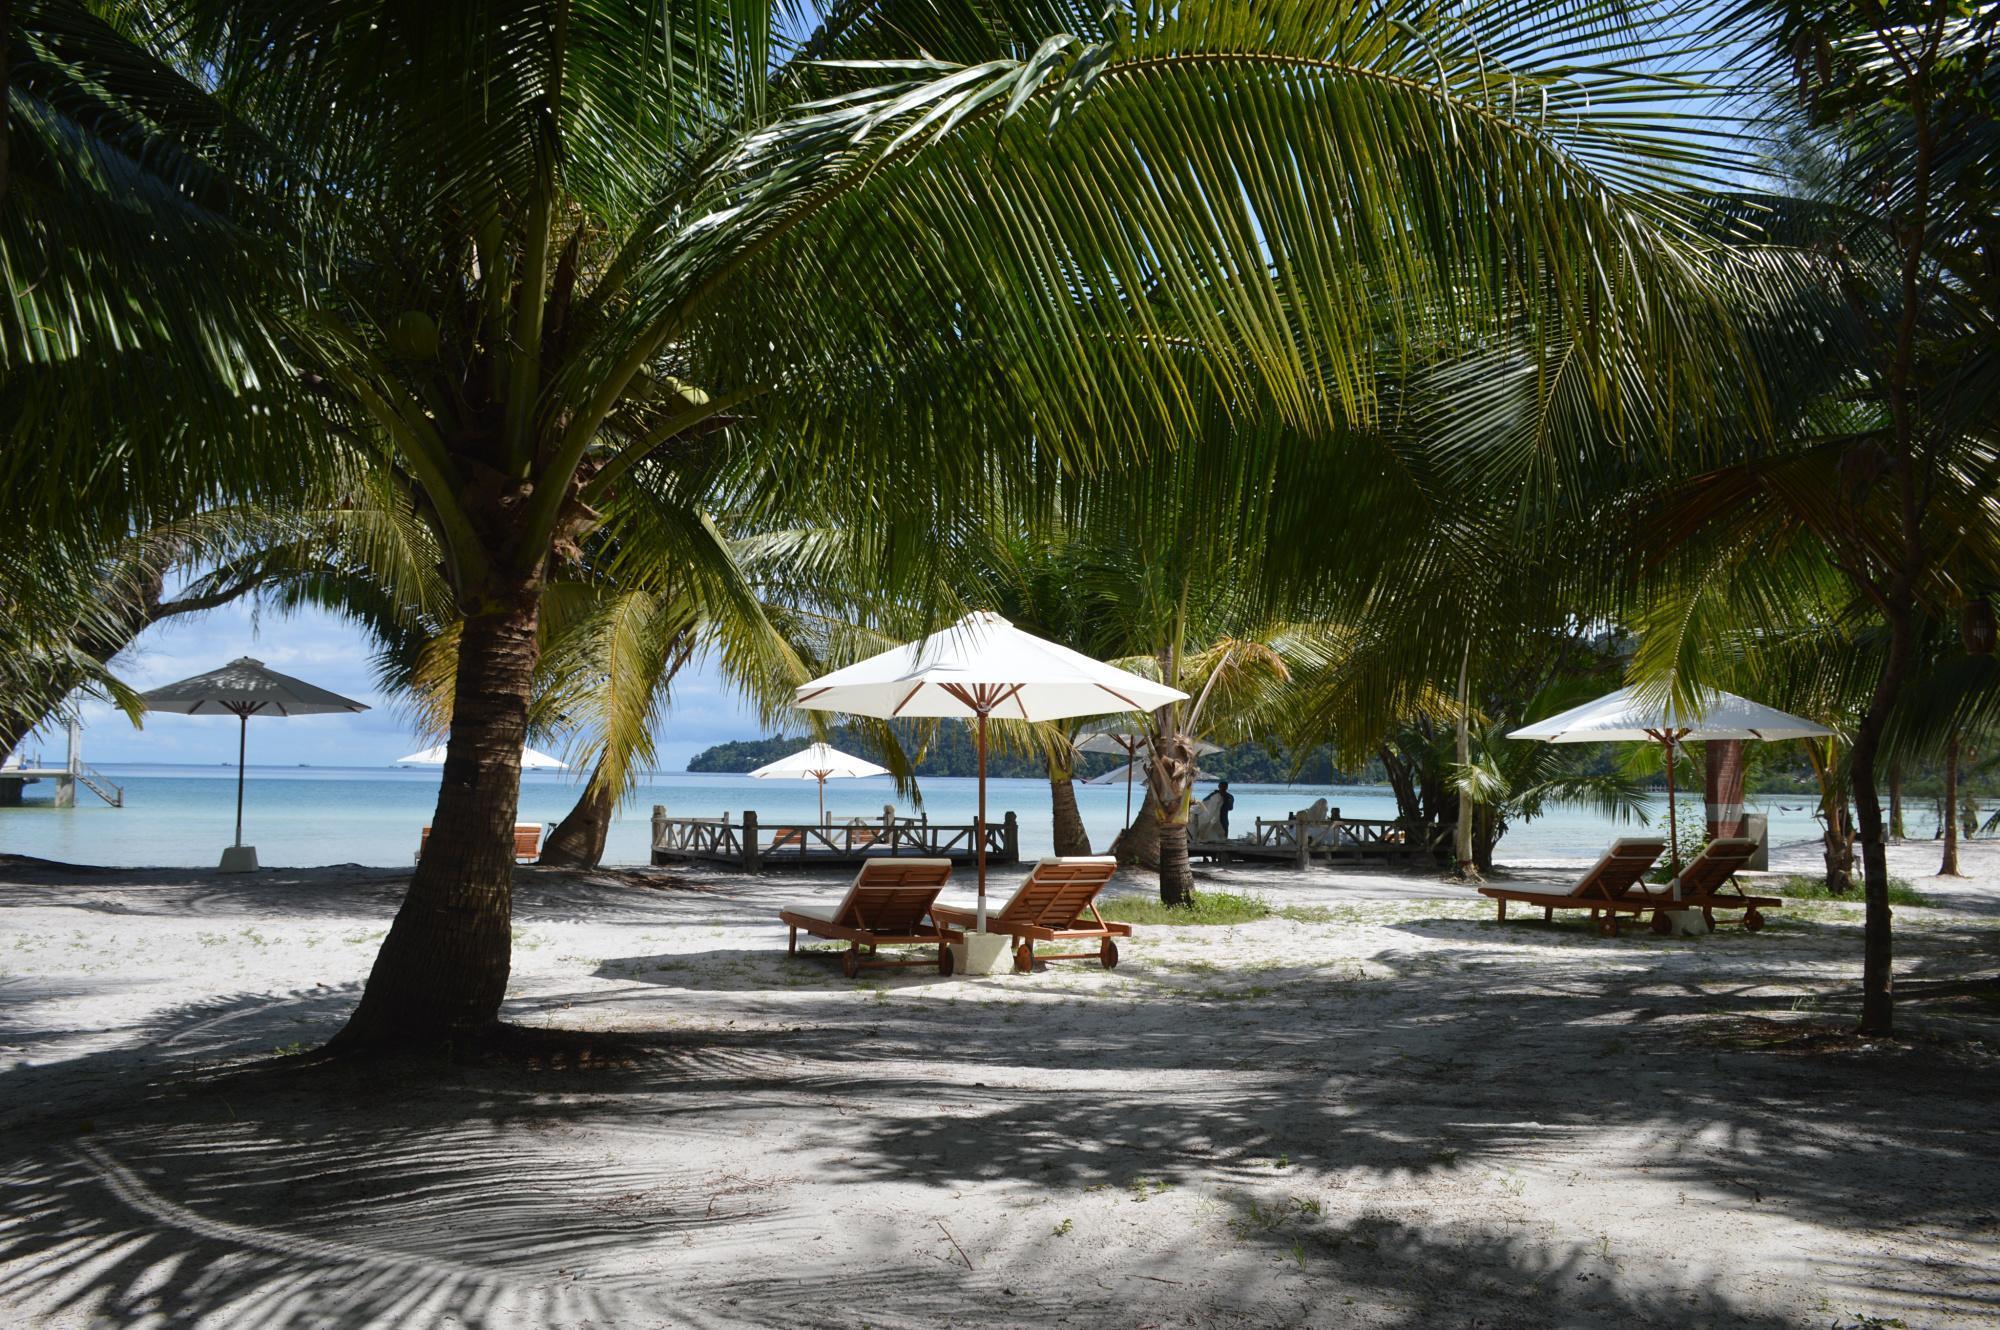 Soon Noeng Resort